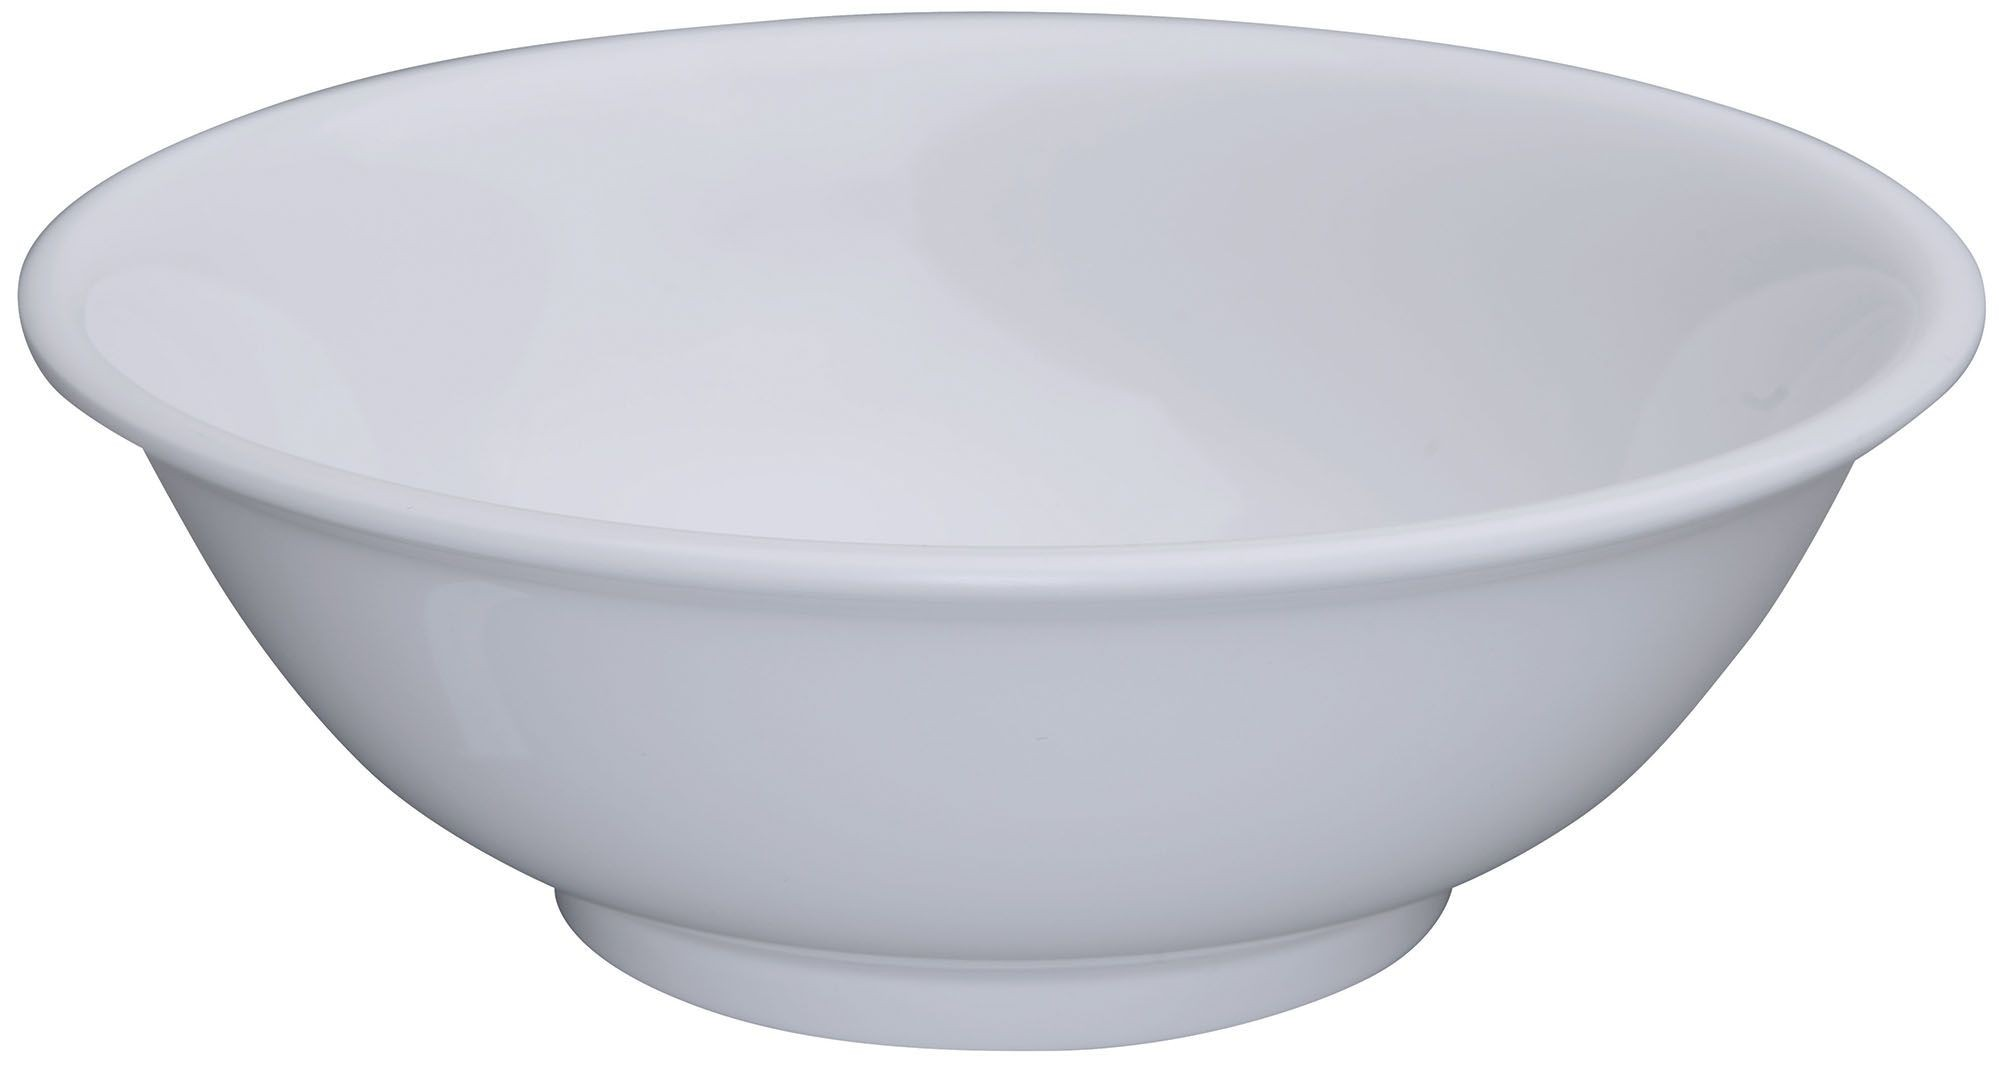 Winco MMB-52W White Melamine Rimless Bowl 52 oz.